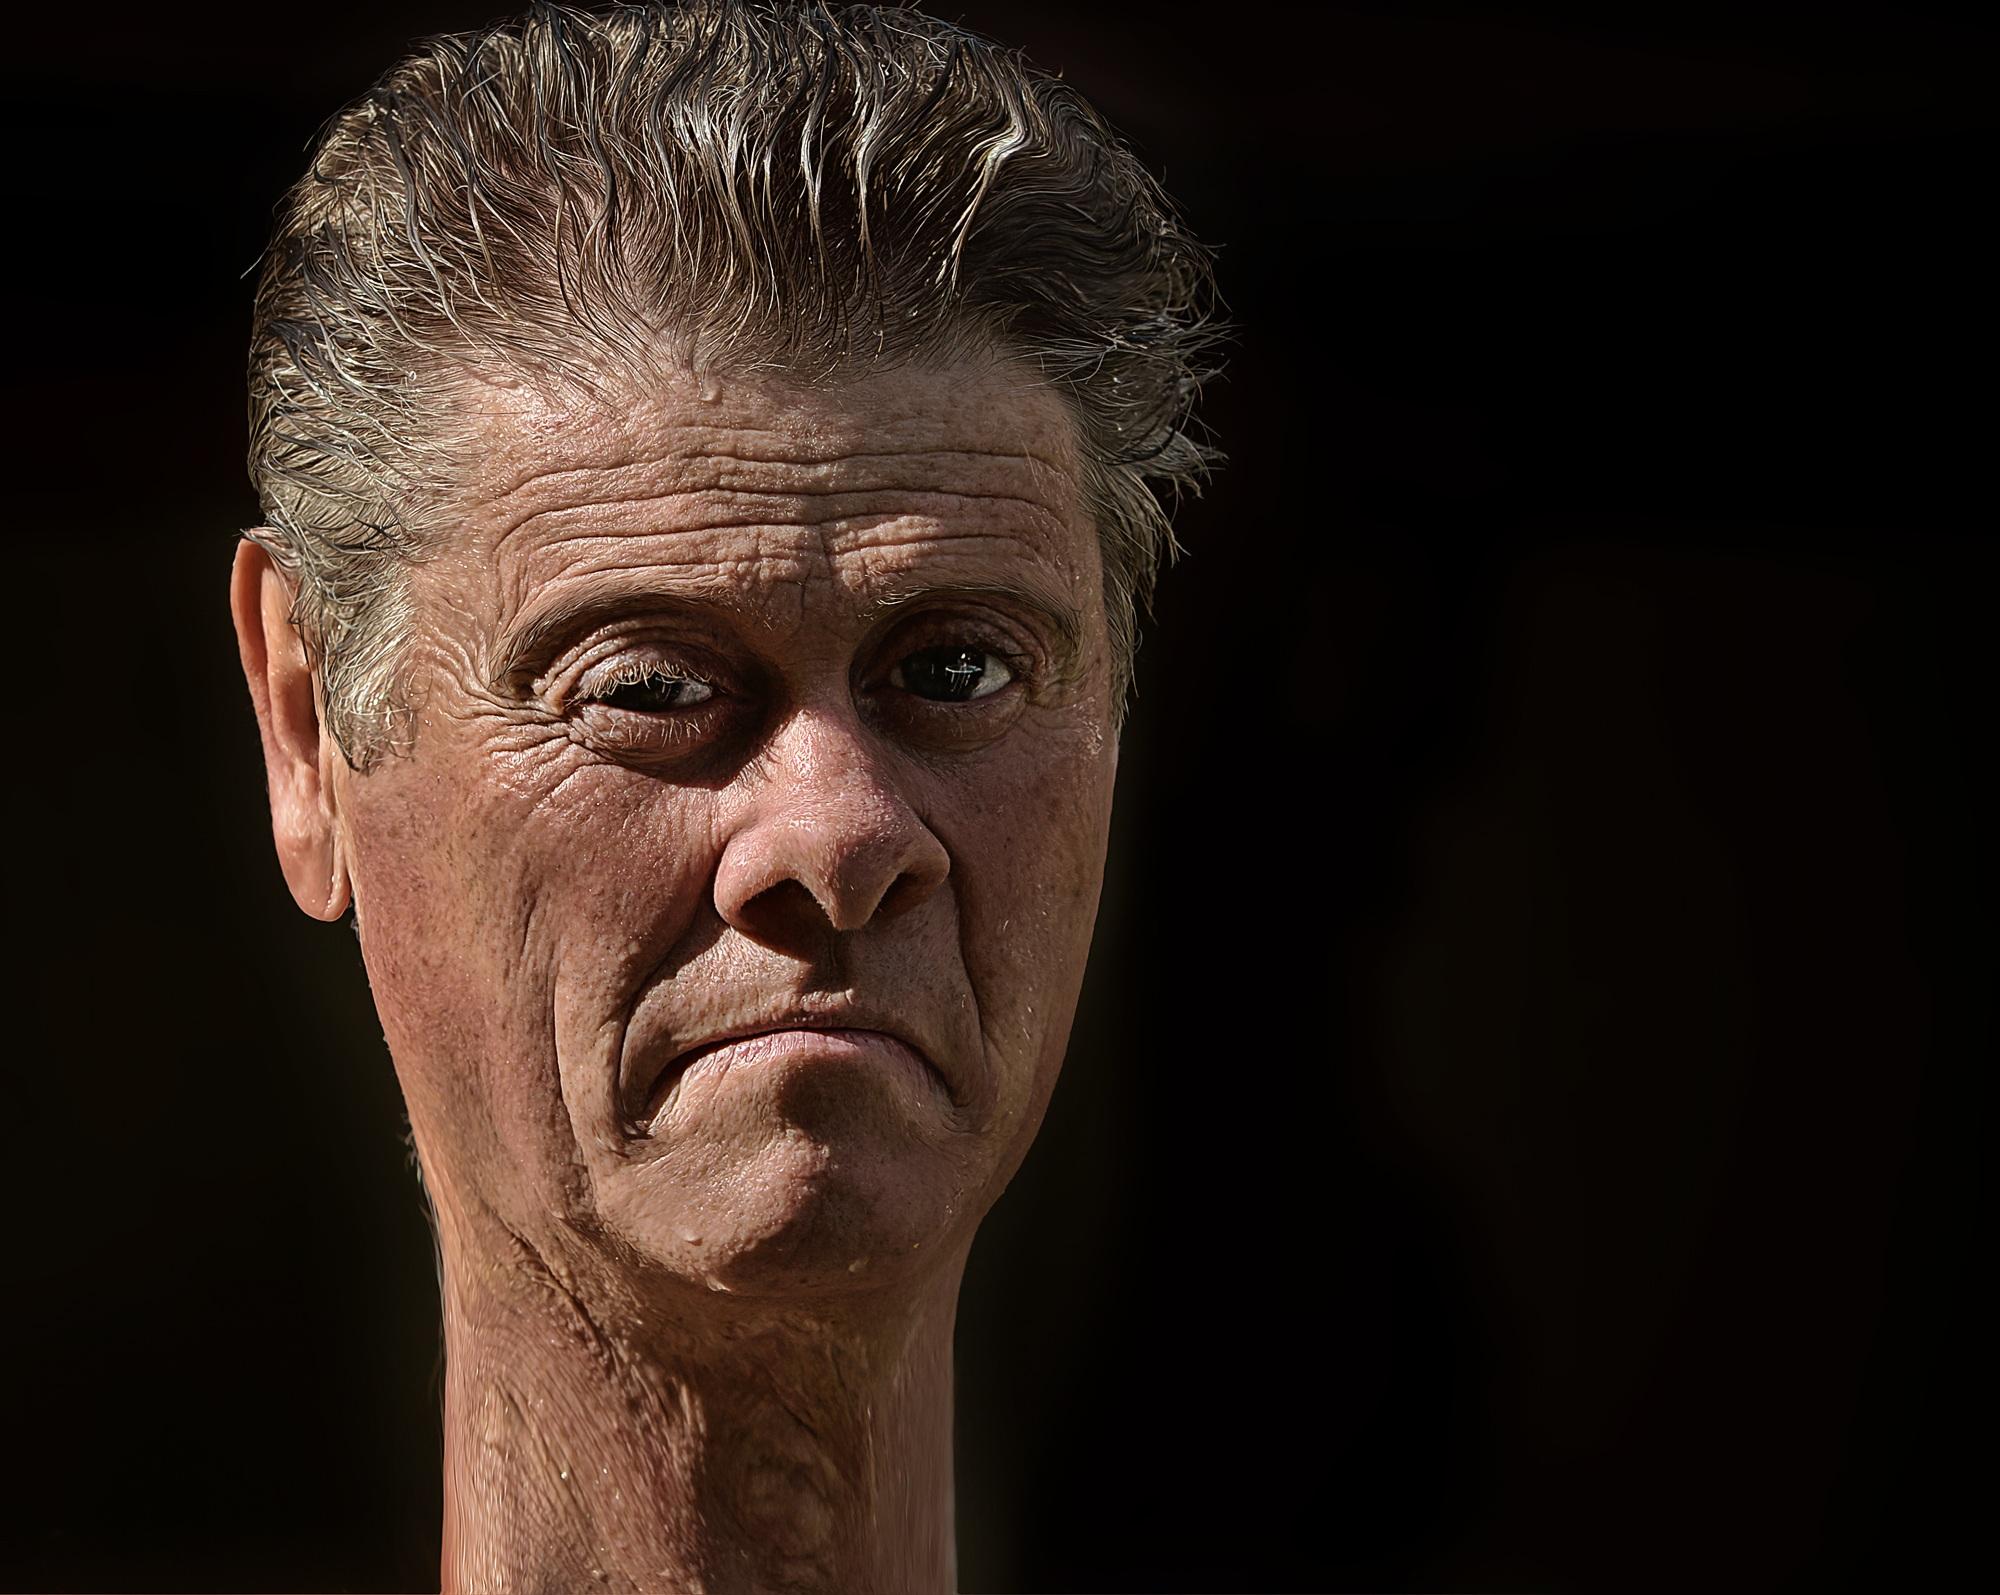 Gambar Manusia Orang Pria Potret Menghadapi Hidung Angka